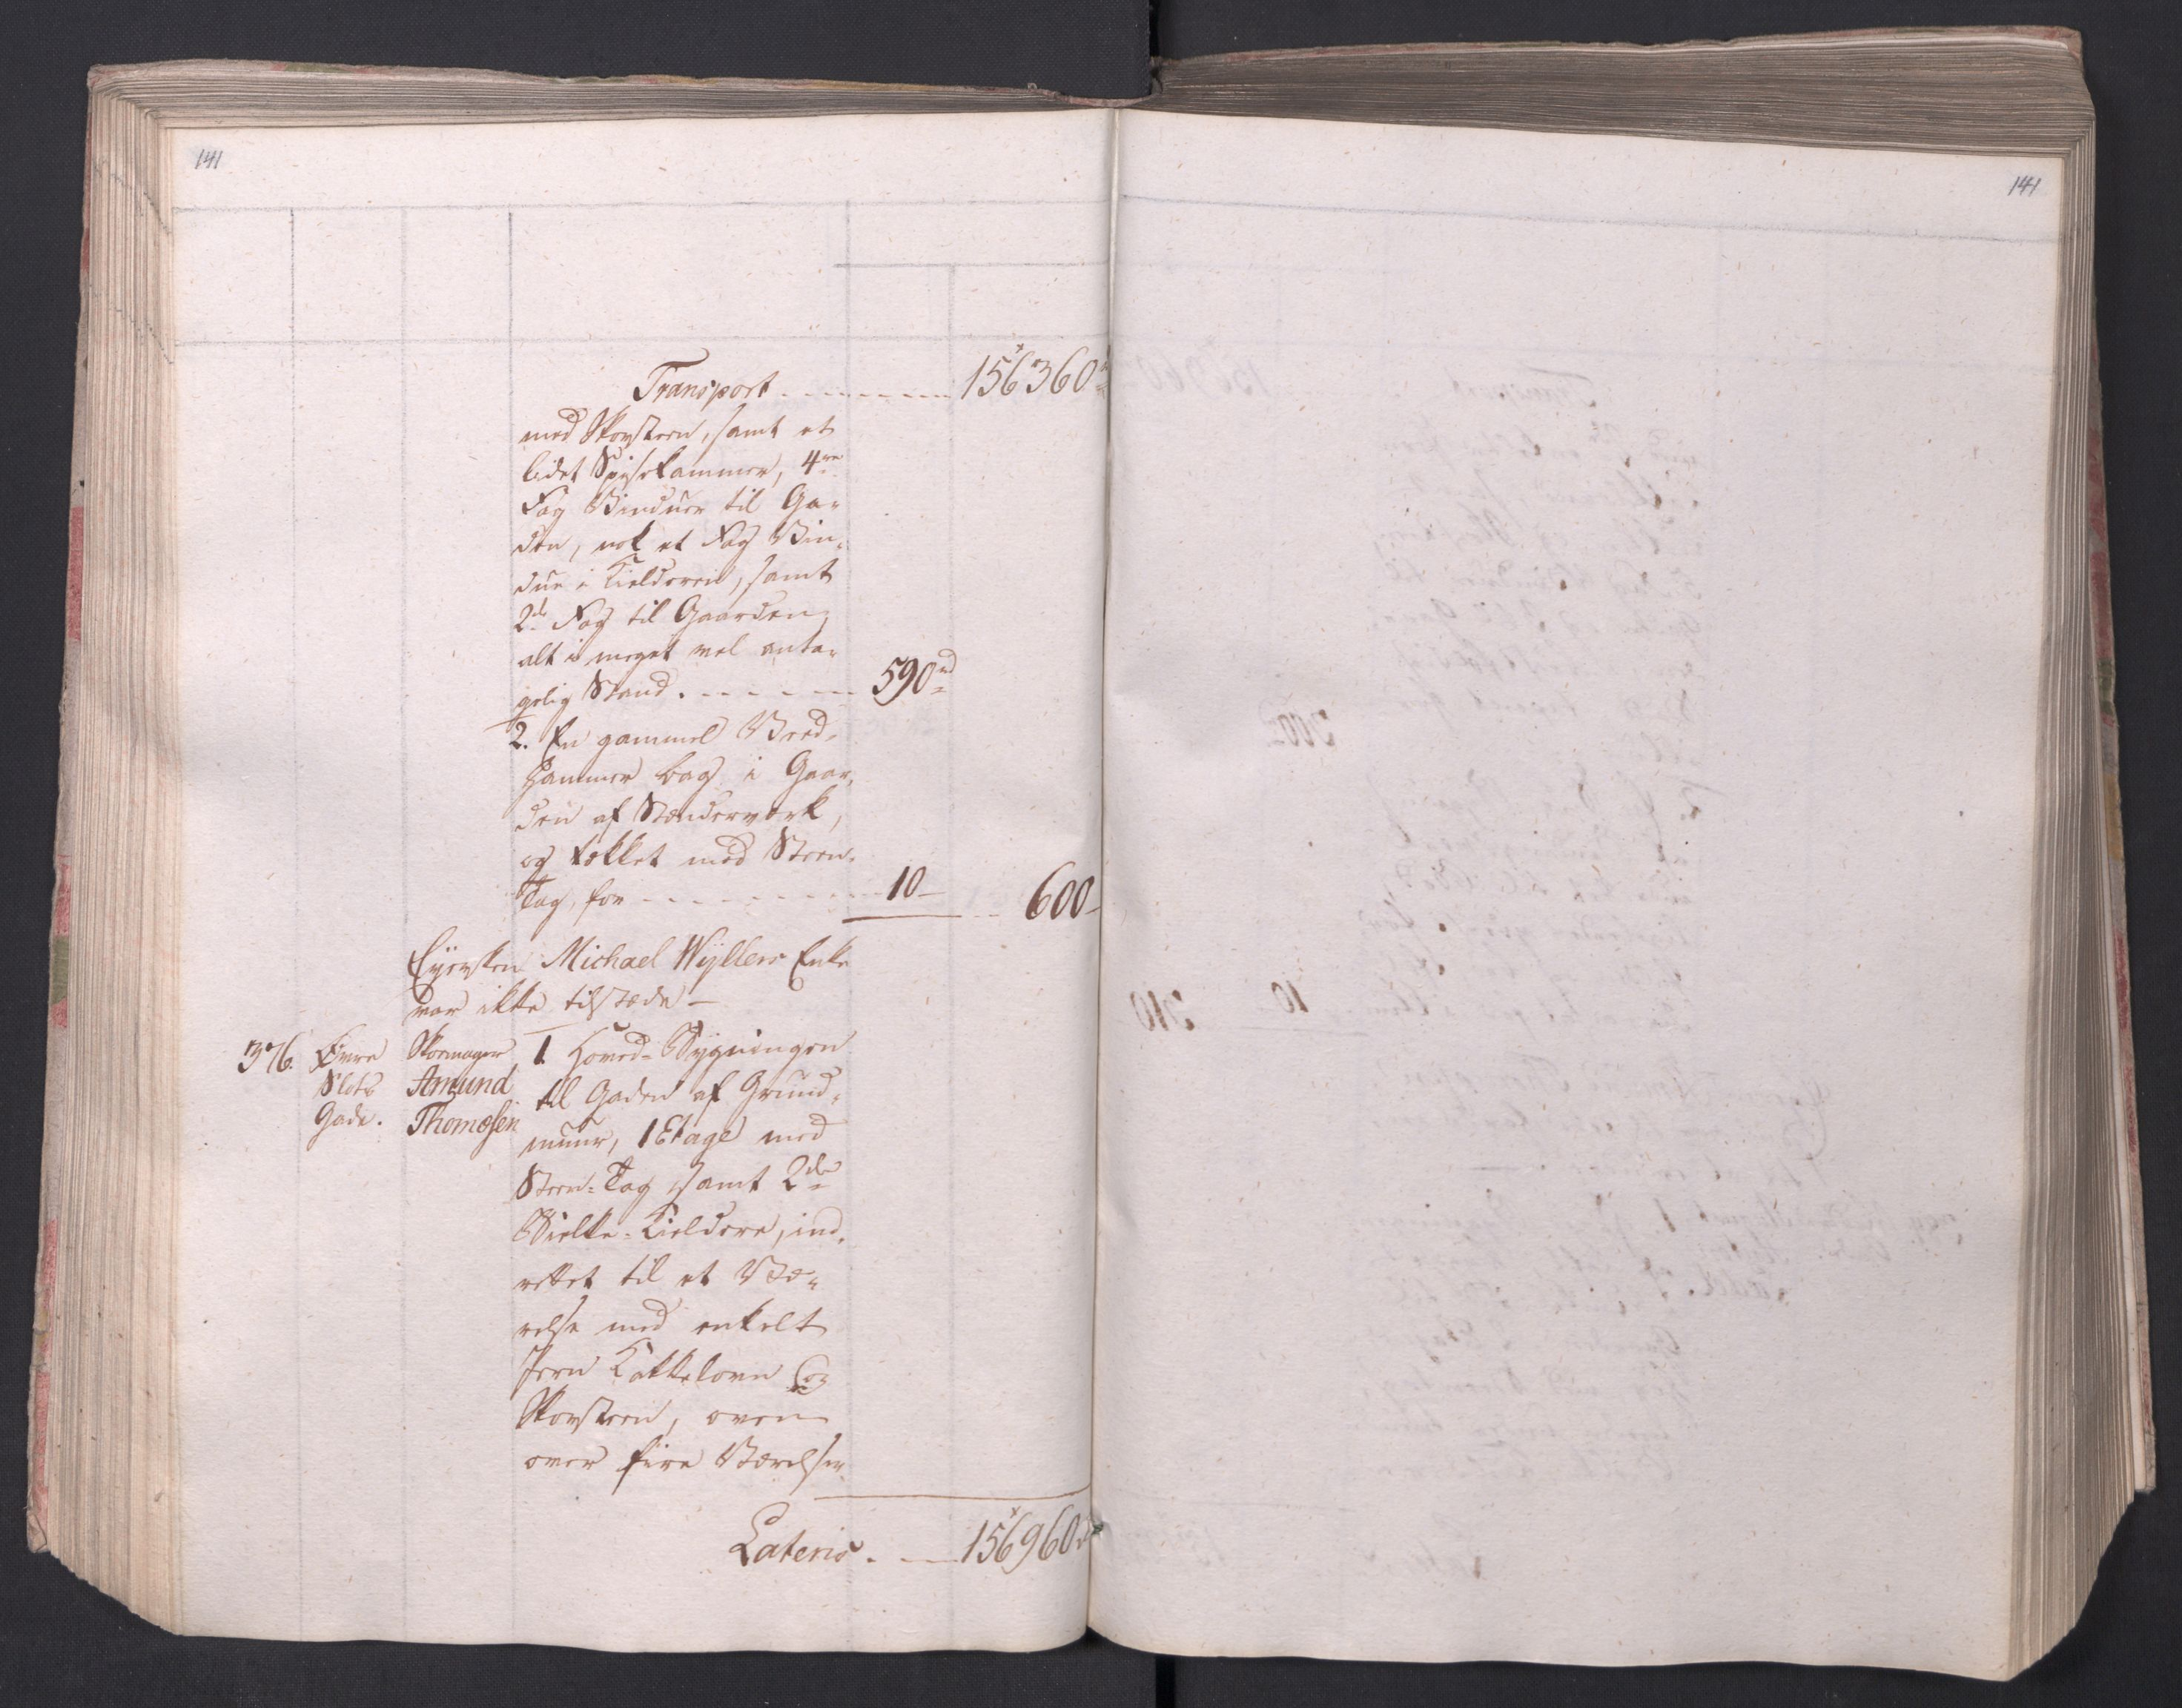 SAO, Kristiania stiftamt, I/Ia/L0015: Branntakster, 1797, s. 141